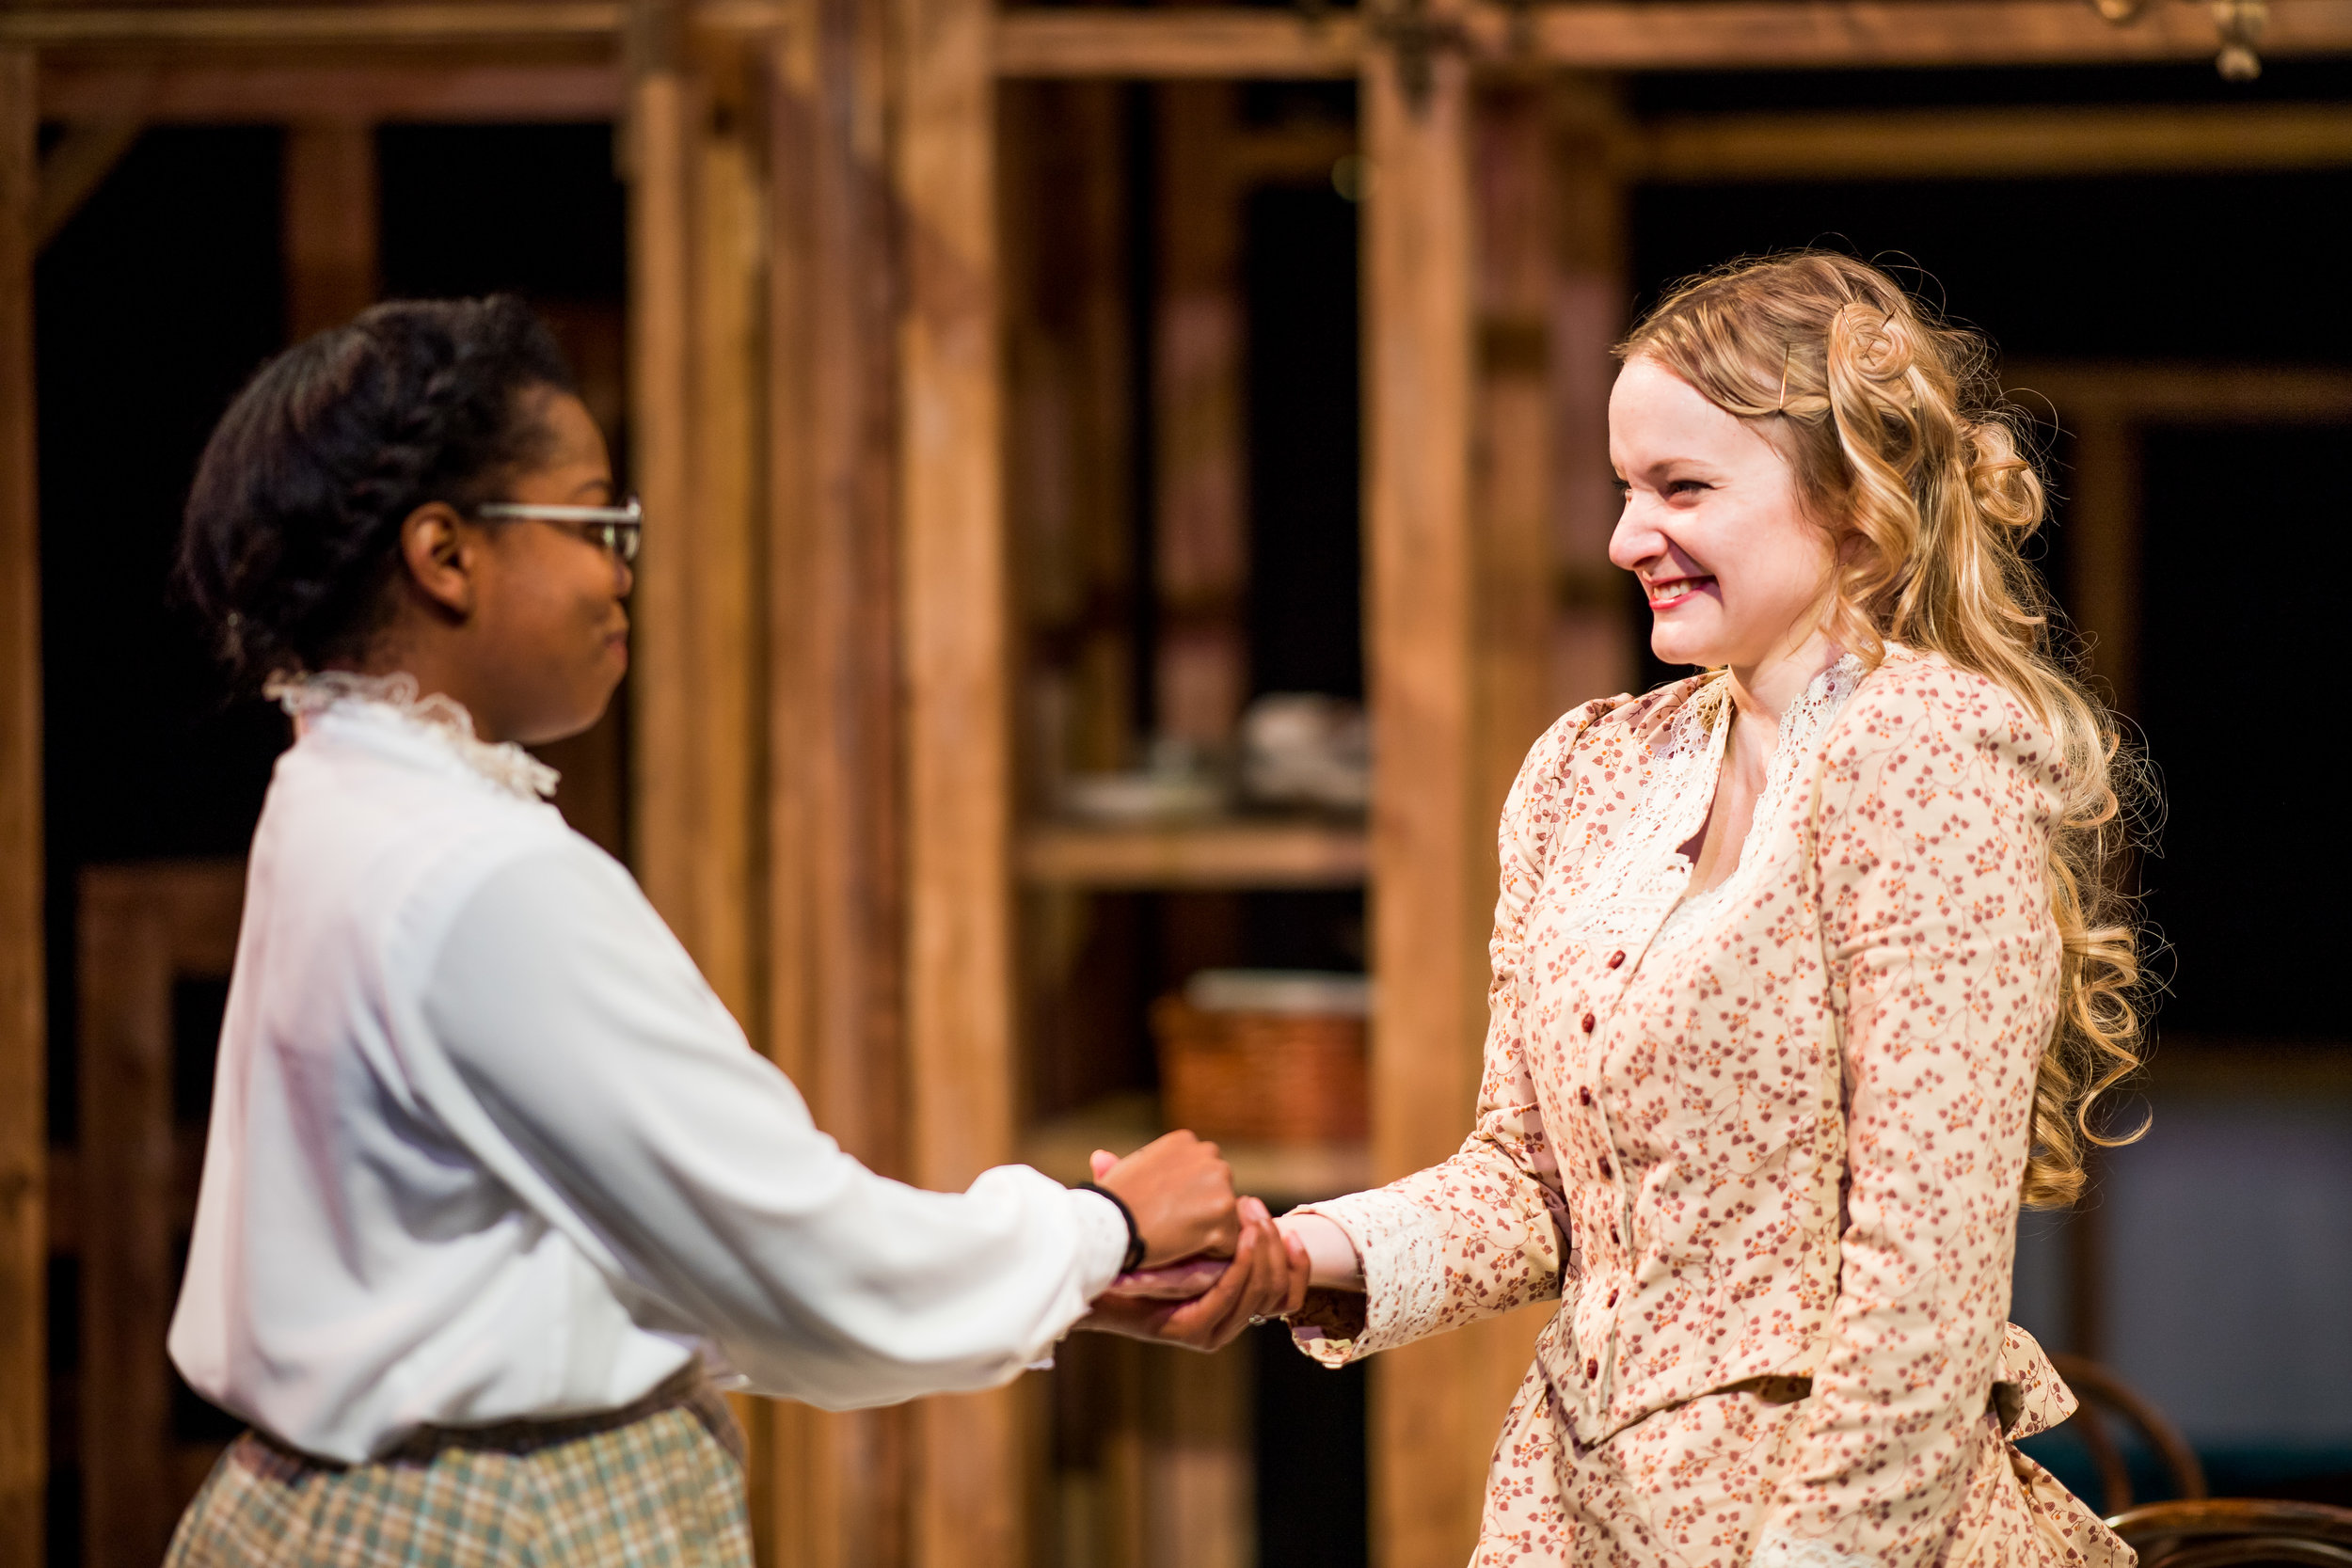 362-Yellow Tree Theatre-Miracle Worker-Helen Keller-Osseo-Minneapolis-community-photography-September 11, 2018-www.jcoxphotography.com.jpg